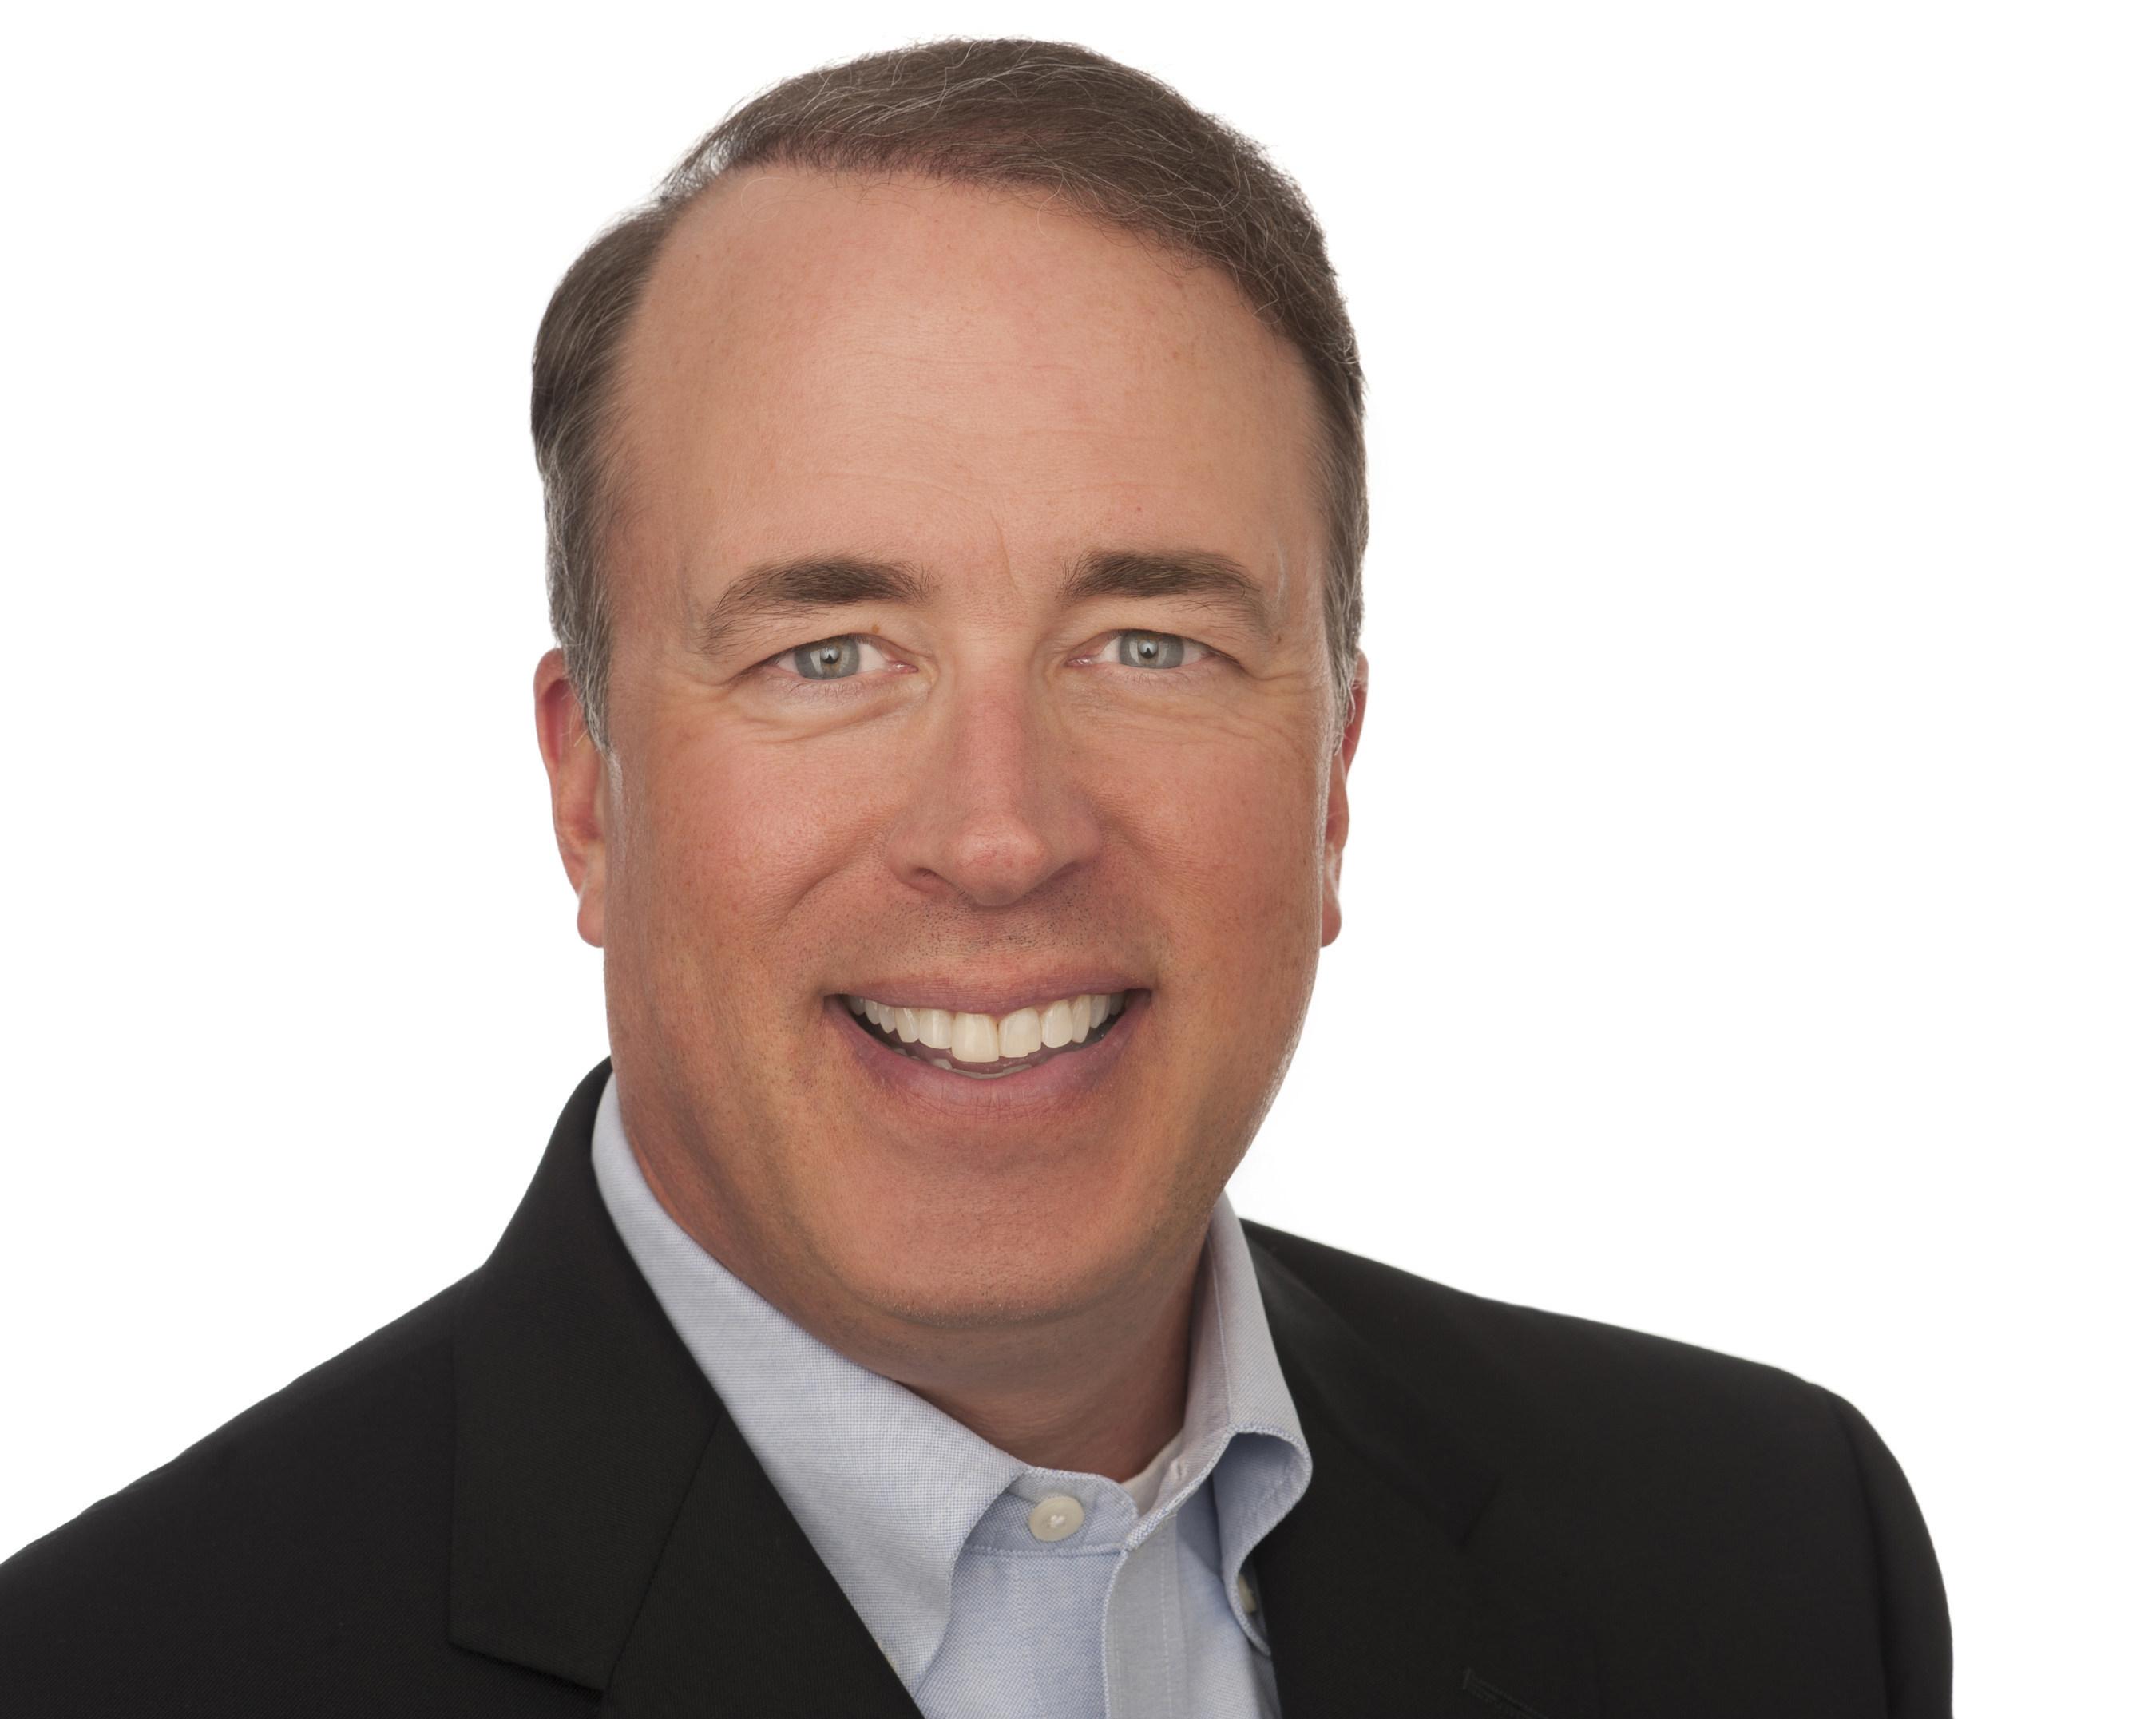 Chris Brockett, President MainStreet Bank